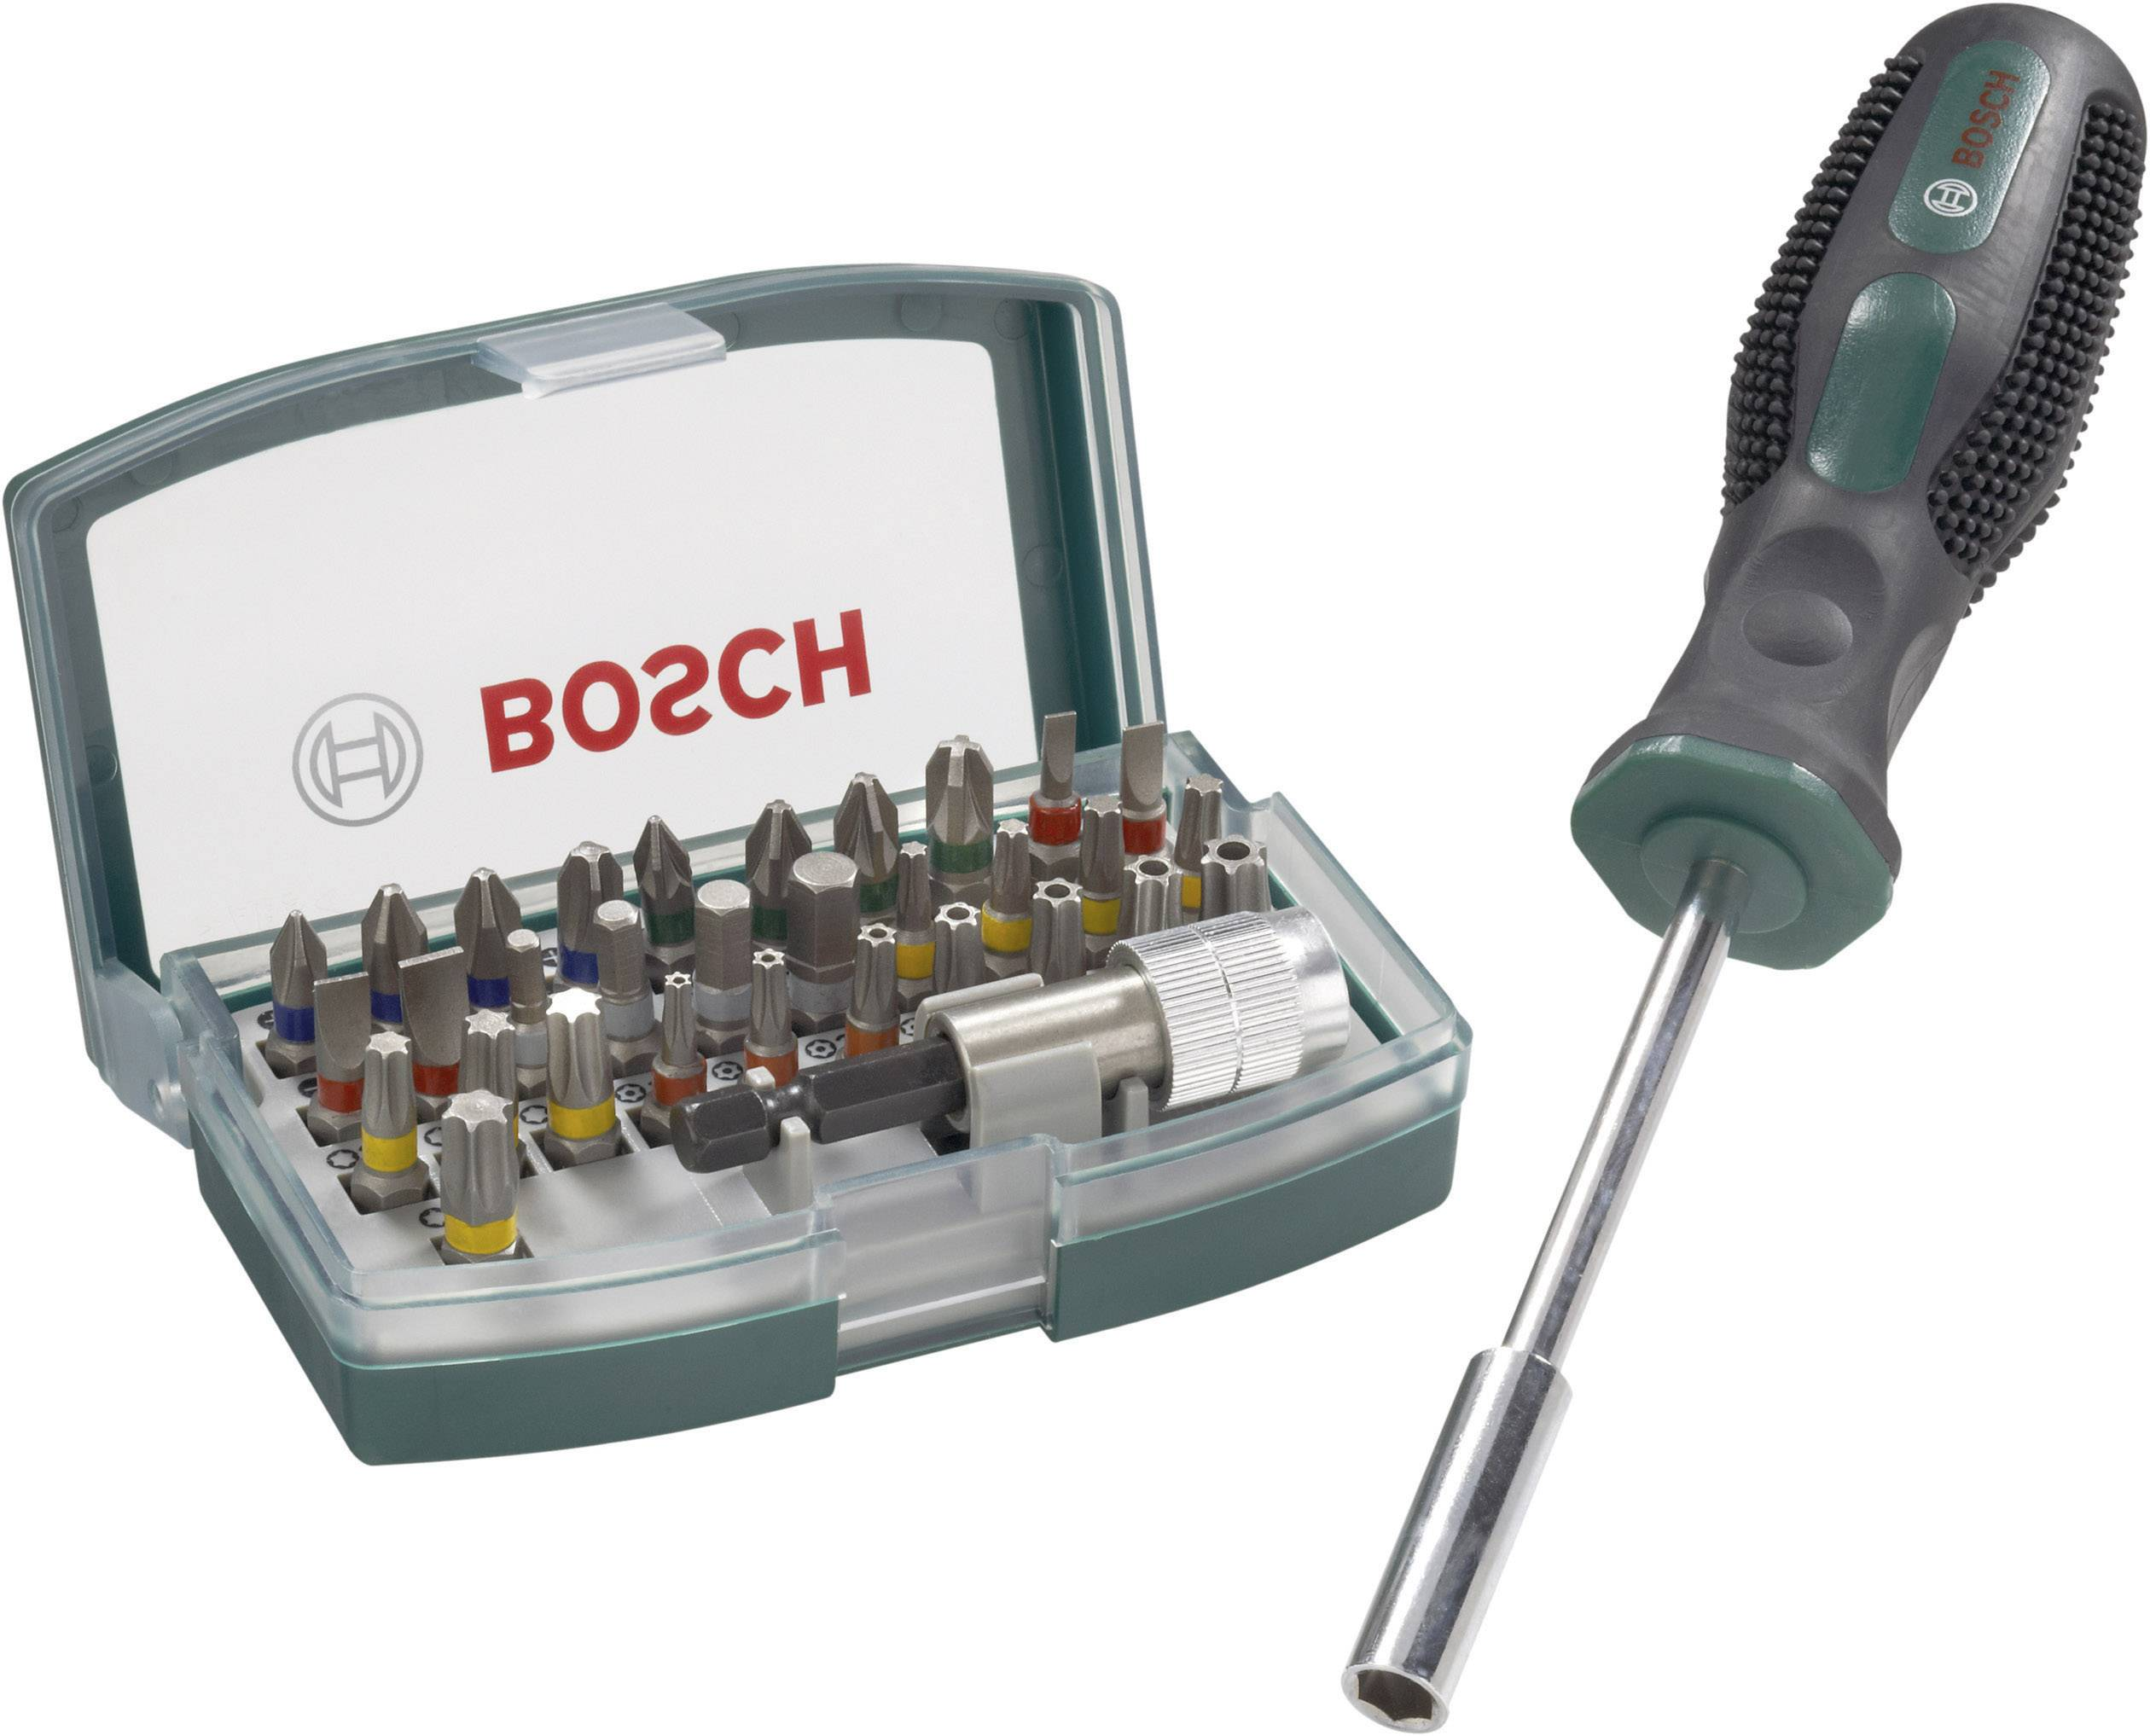 Sada bitů Bosch 32 ks + šroubovák